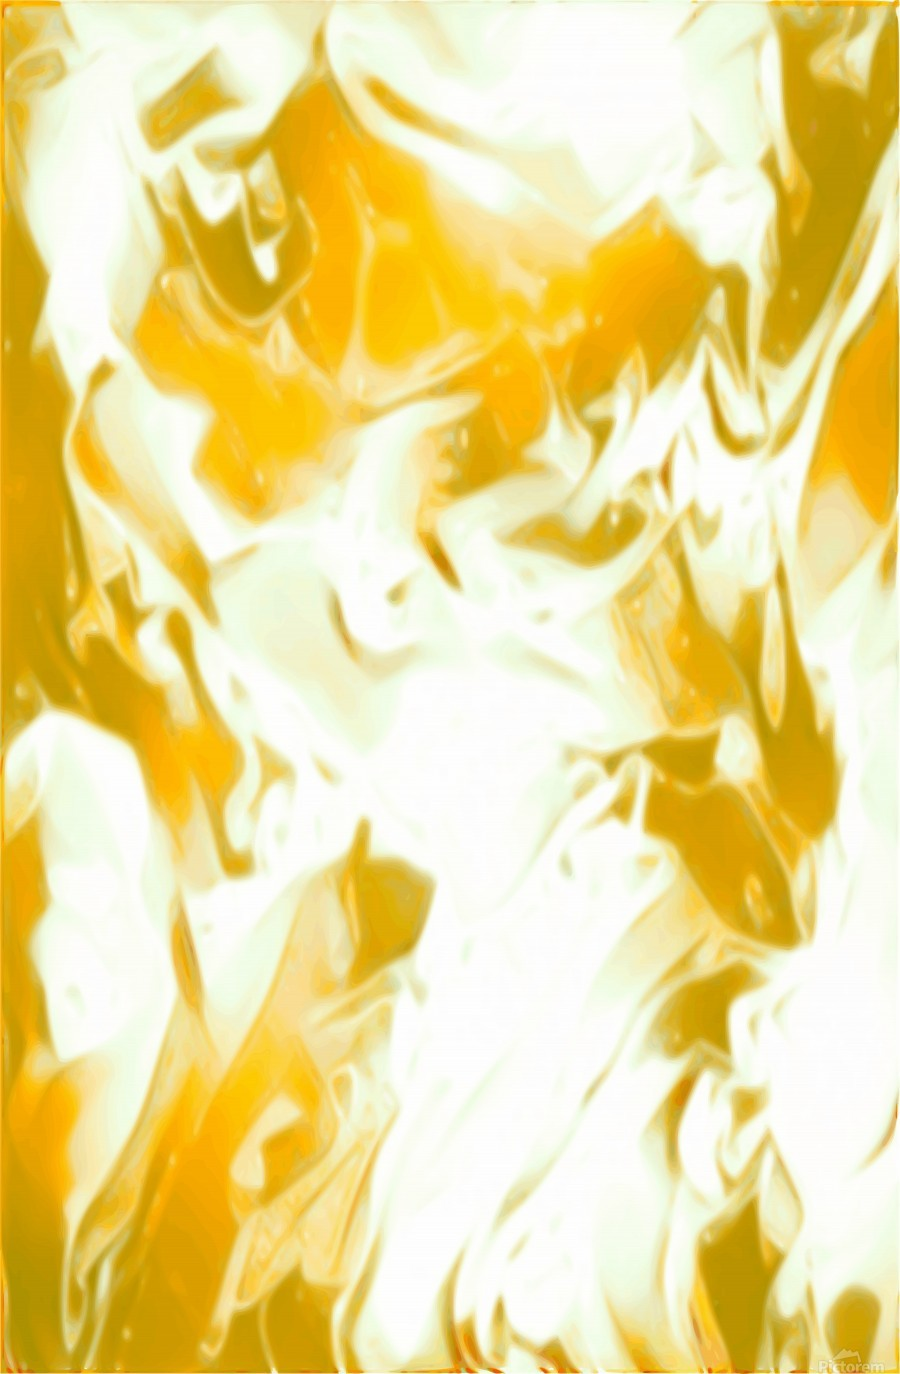 Abundant Aura - white gold swirls abstract wall art - Jaycrave Designs -  Canvas Artwork